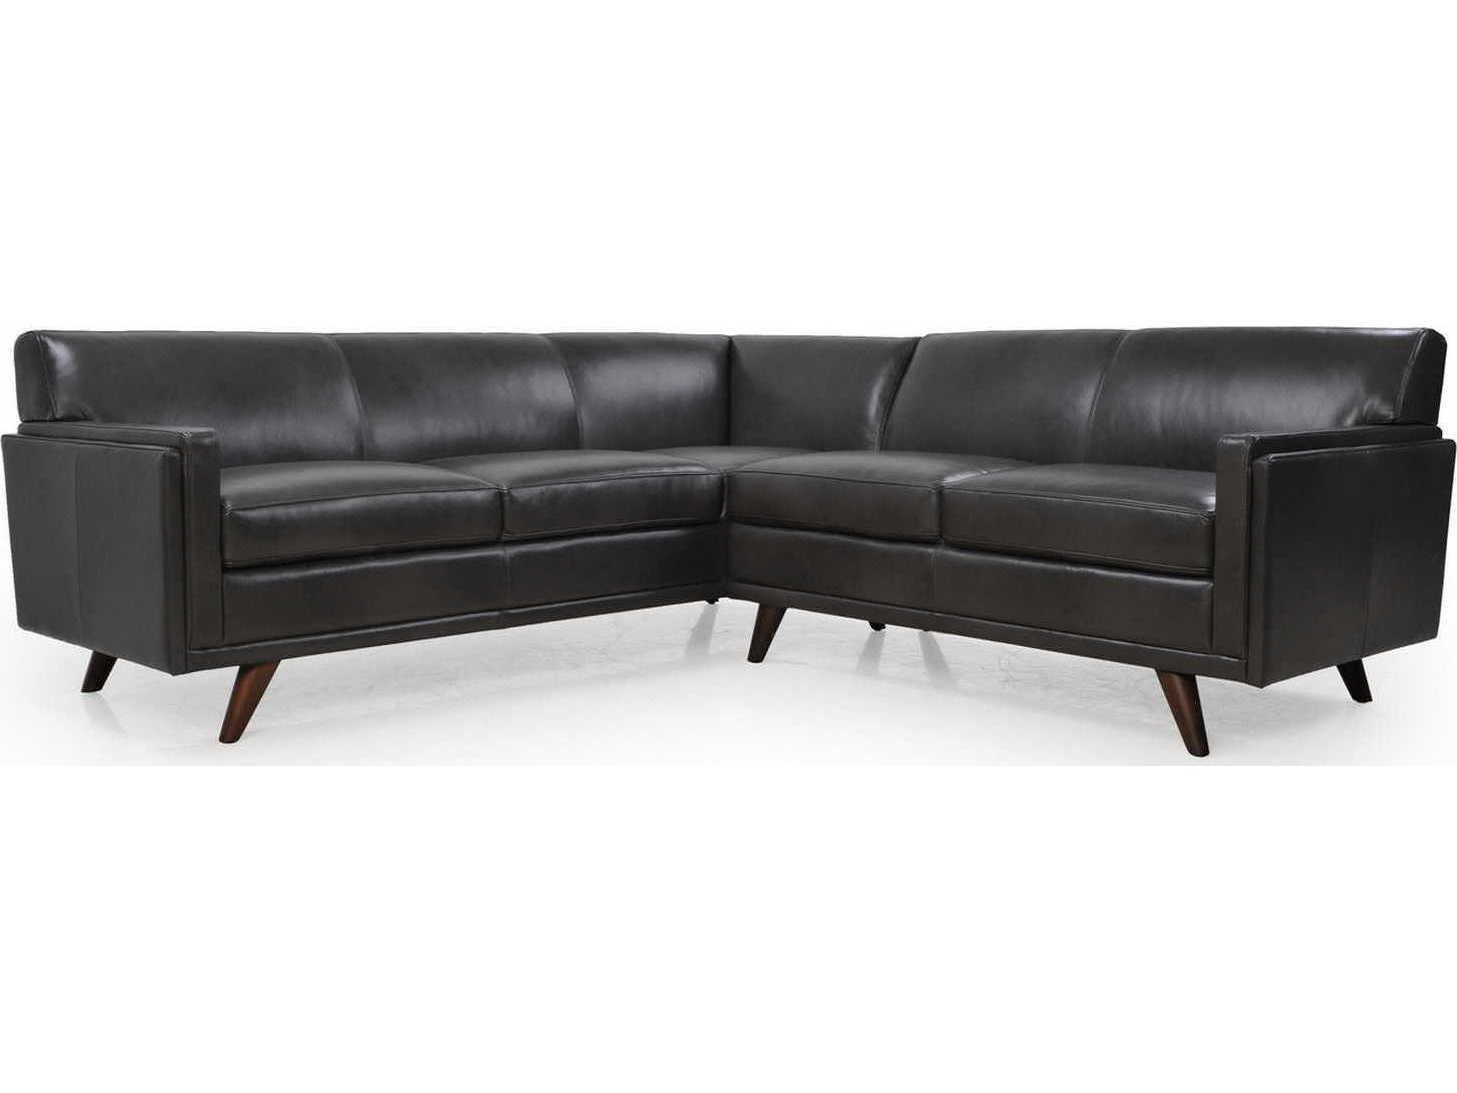 Moroni Milo Mid Century Charcoal Two Piece Sectional Sofa